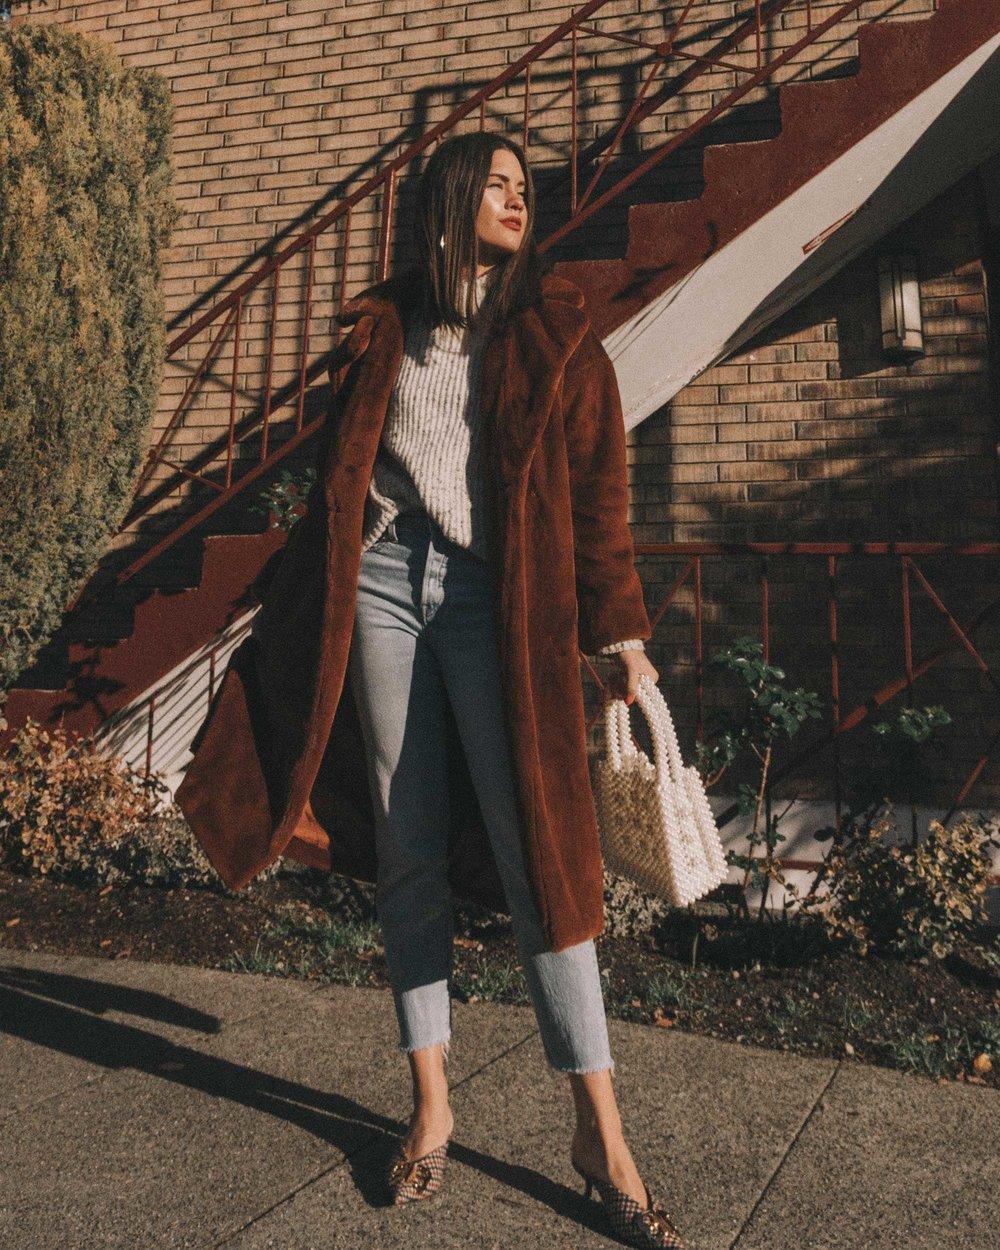 Topshop Bella Velvet Brown Faux Fur Coat winter outfit levis wedgie jeans seattle.jpg